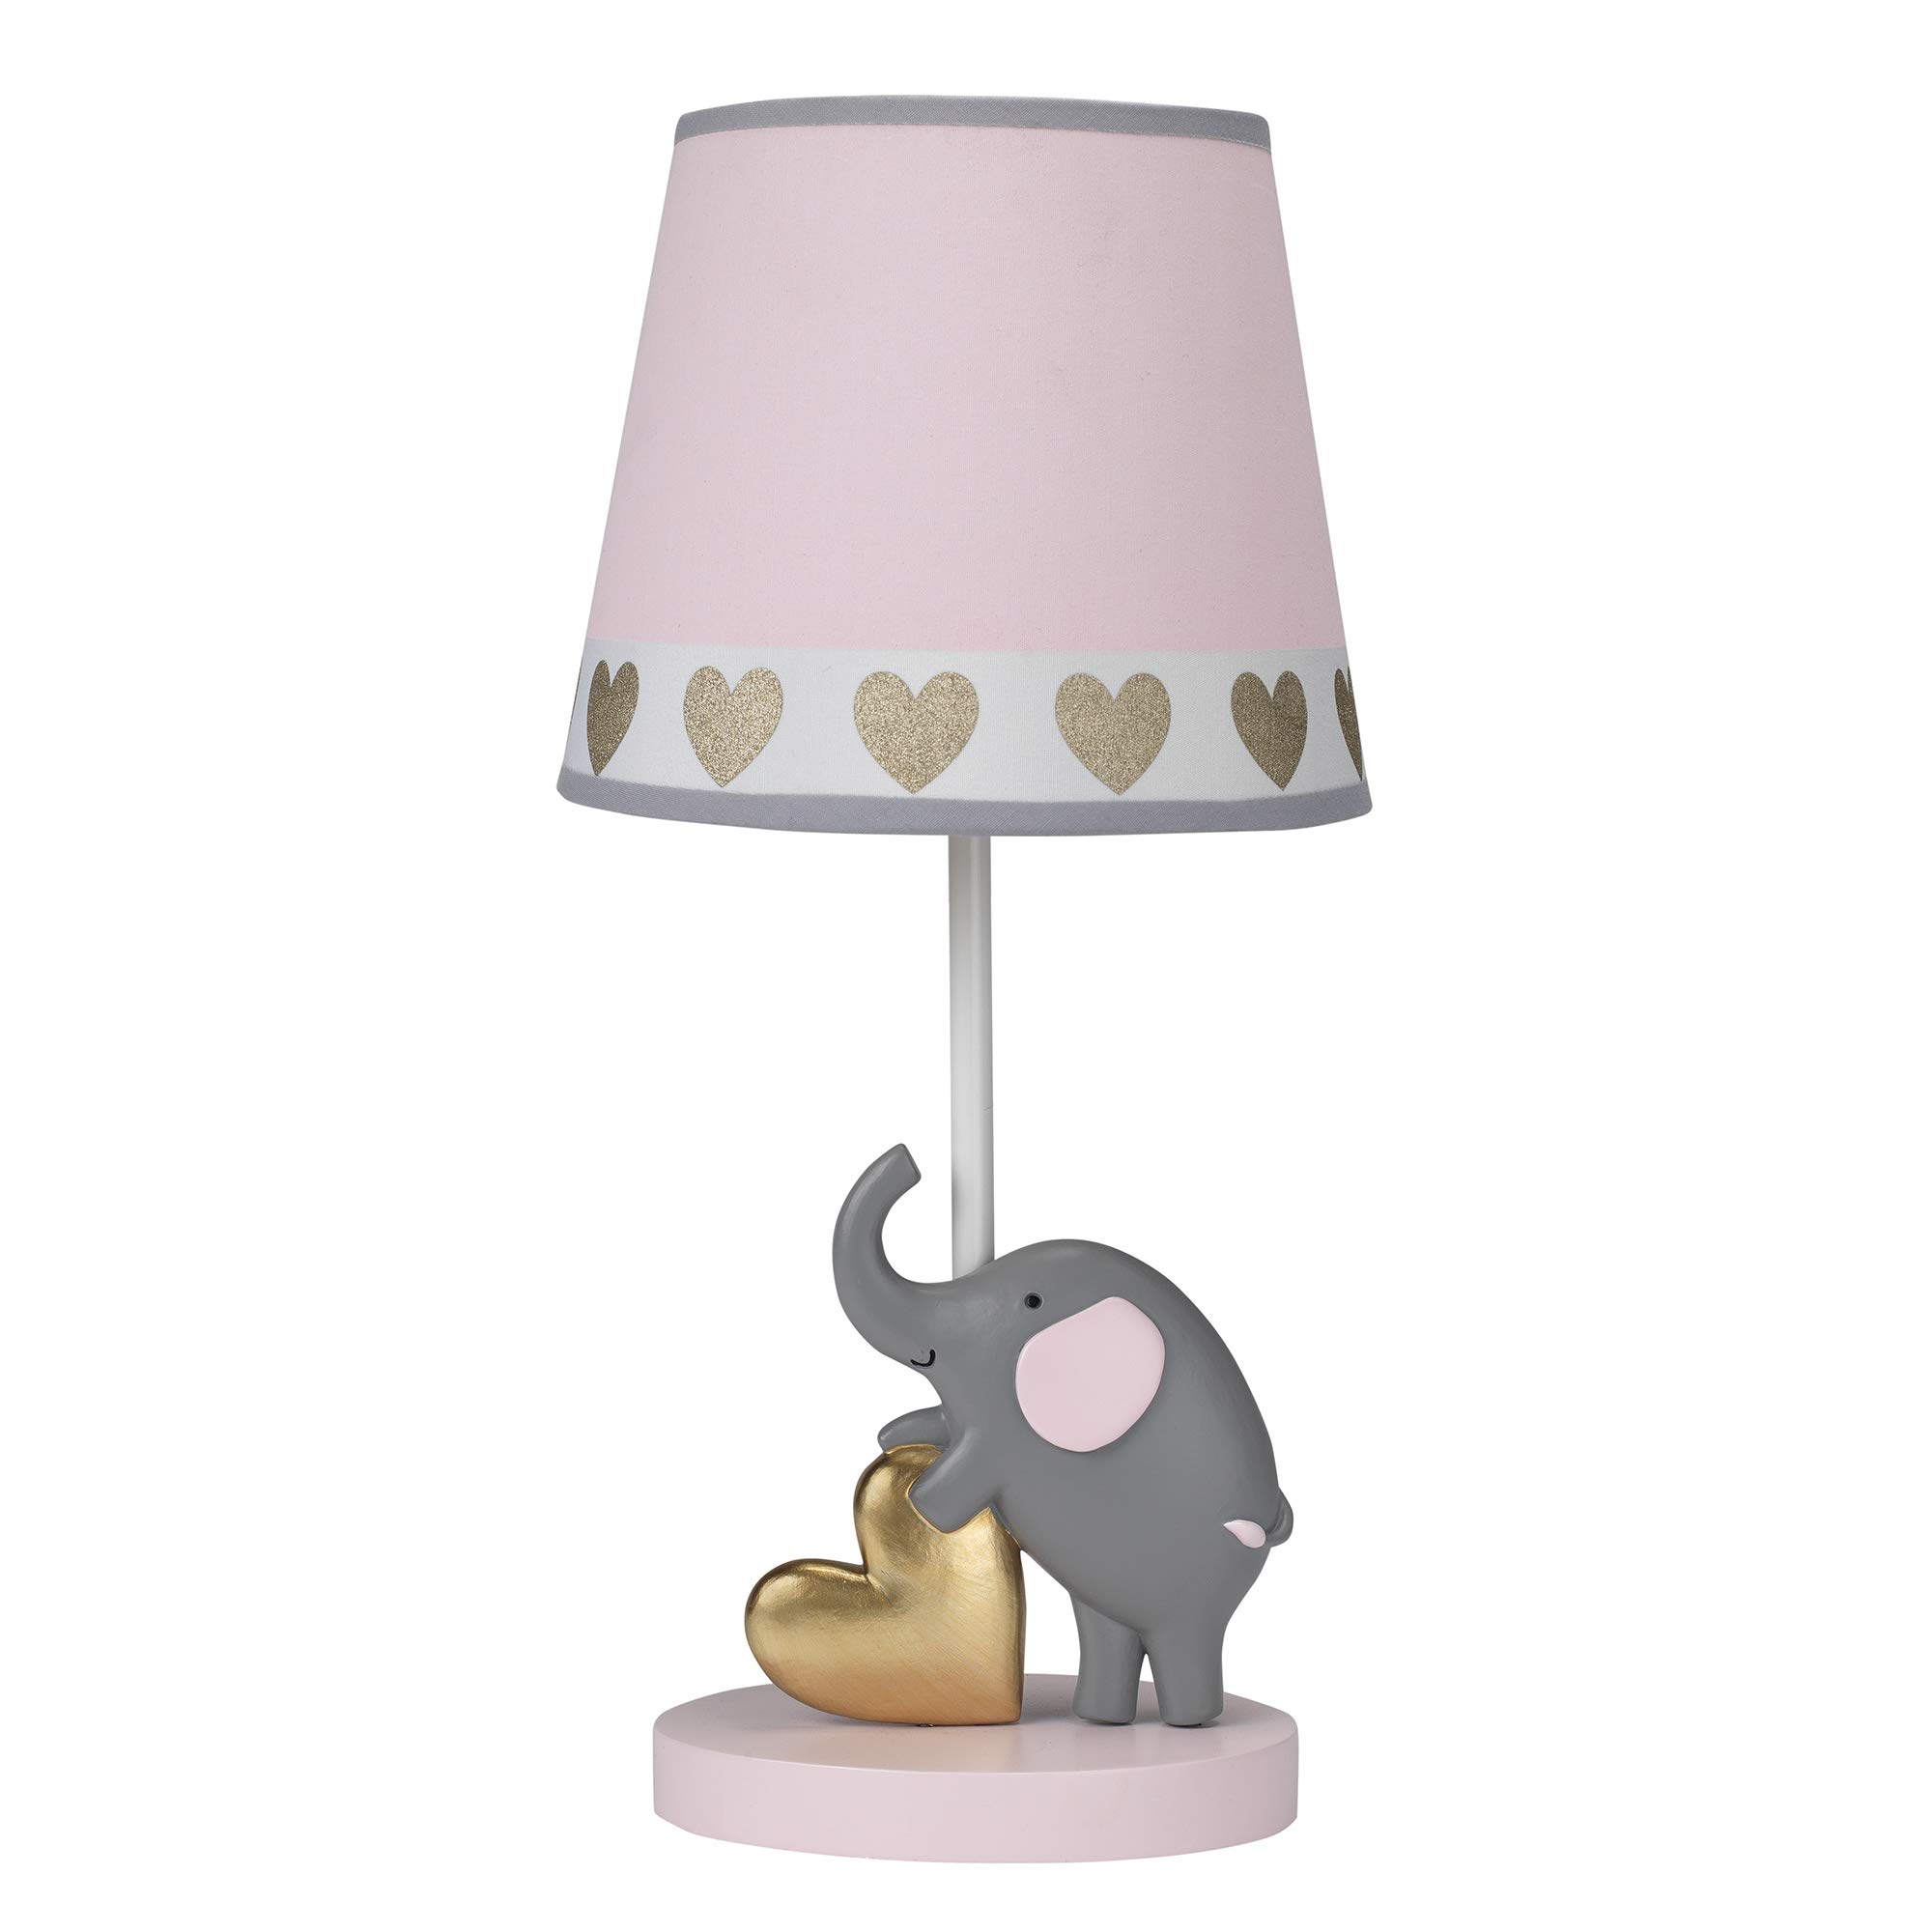 Bedtime Originals Eloise Nursery Lamp & Shade with Bulb by Bedtime Originals